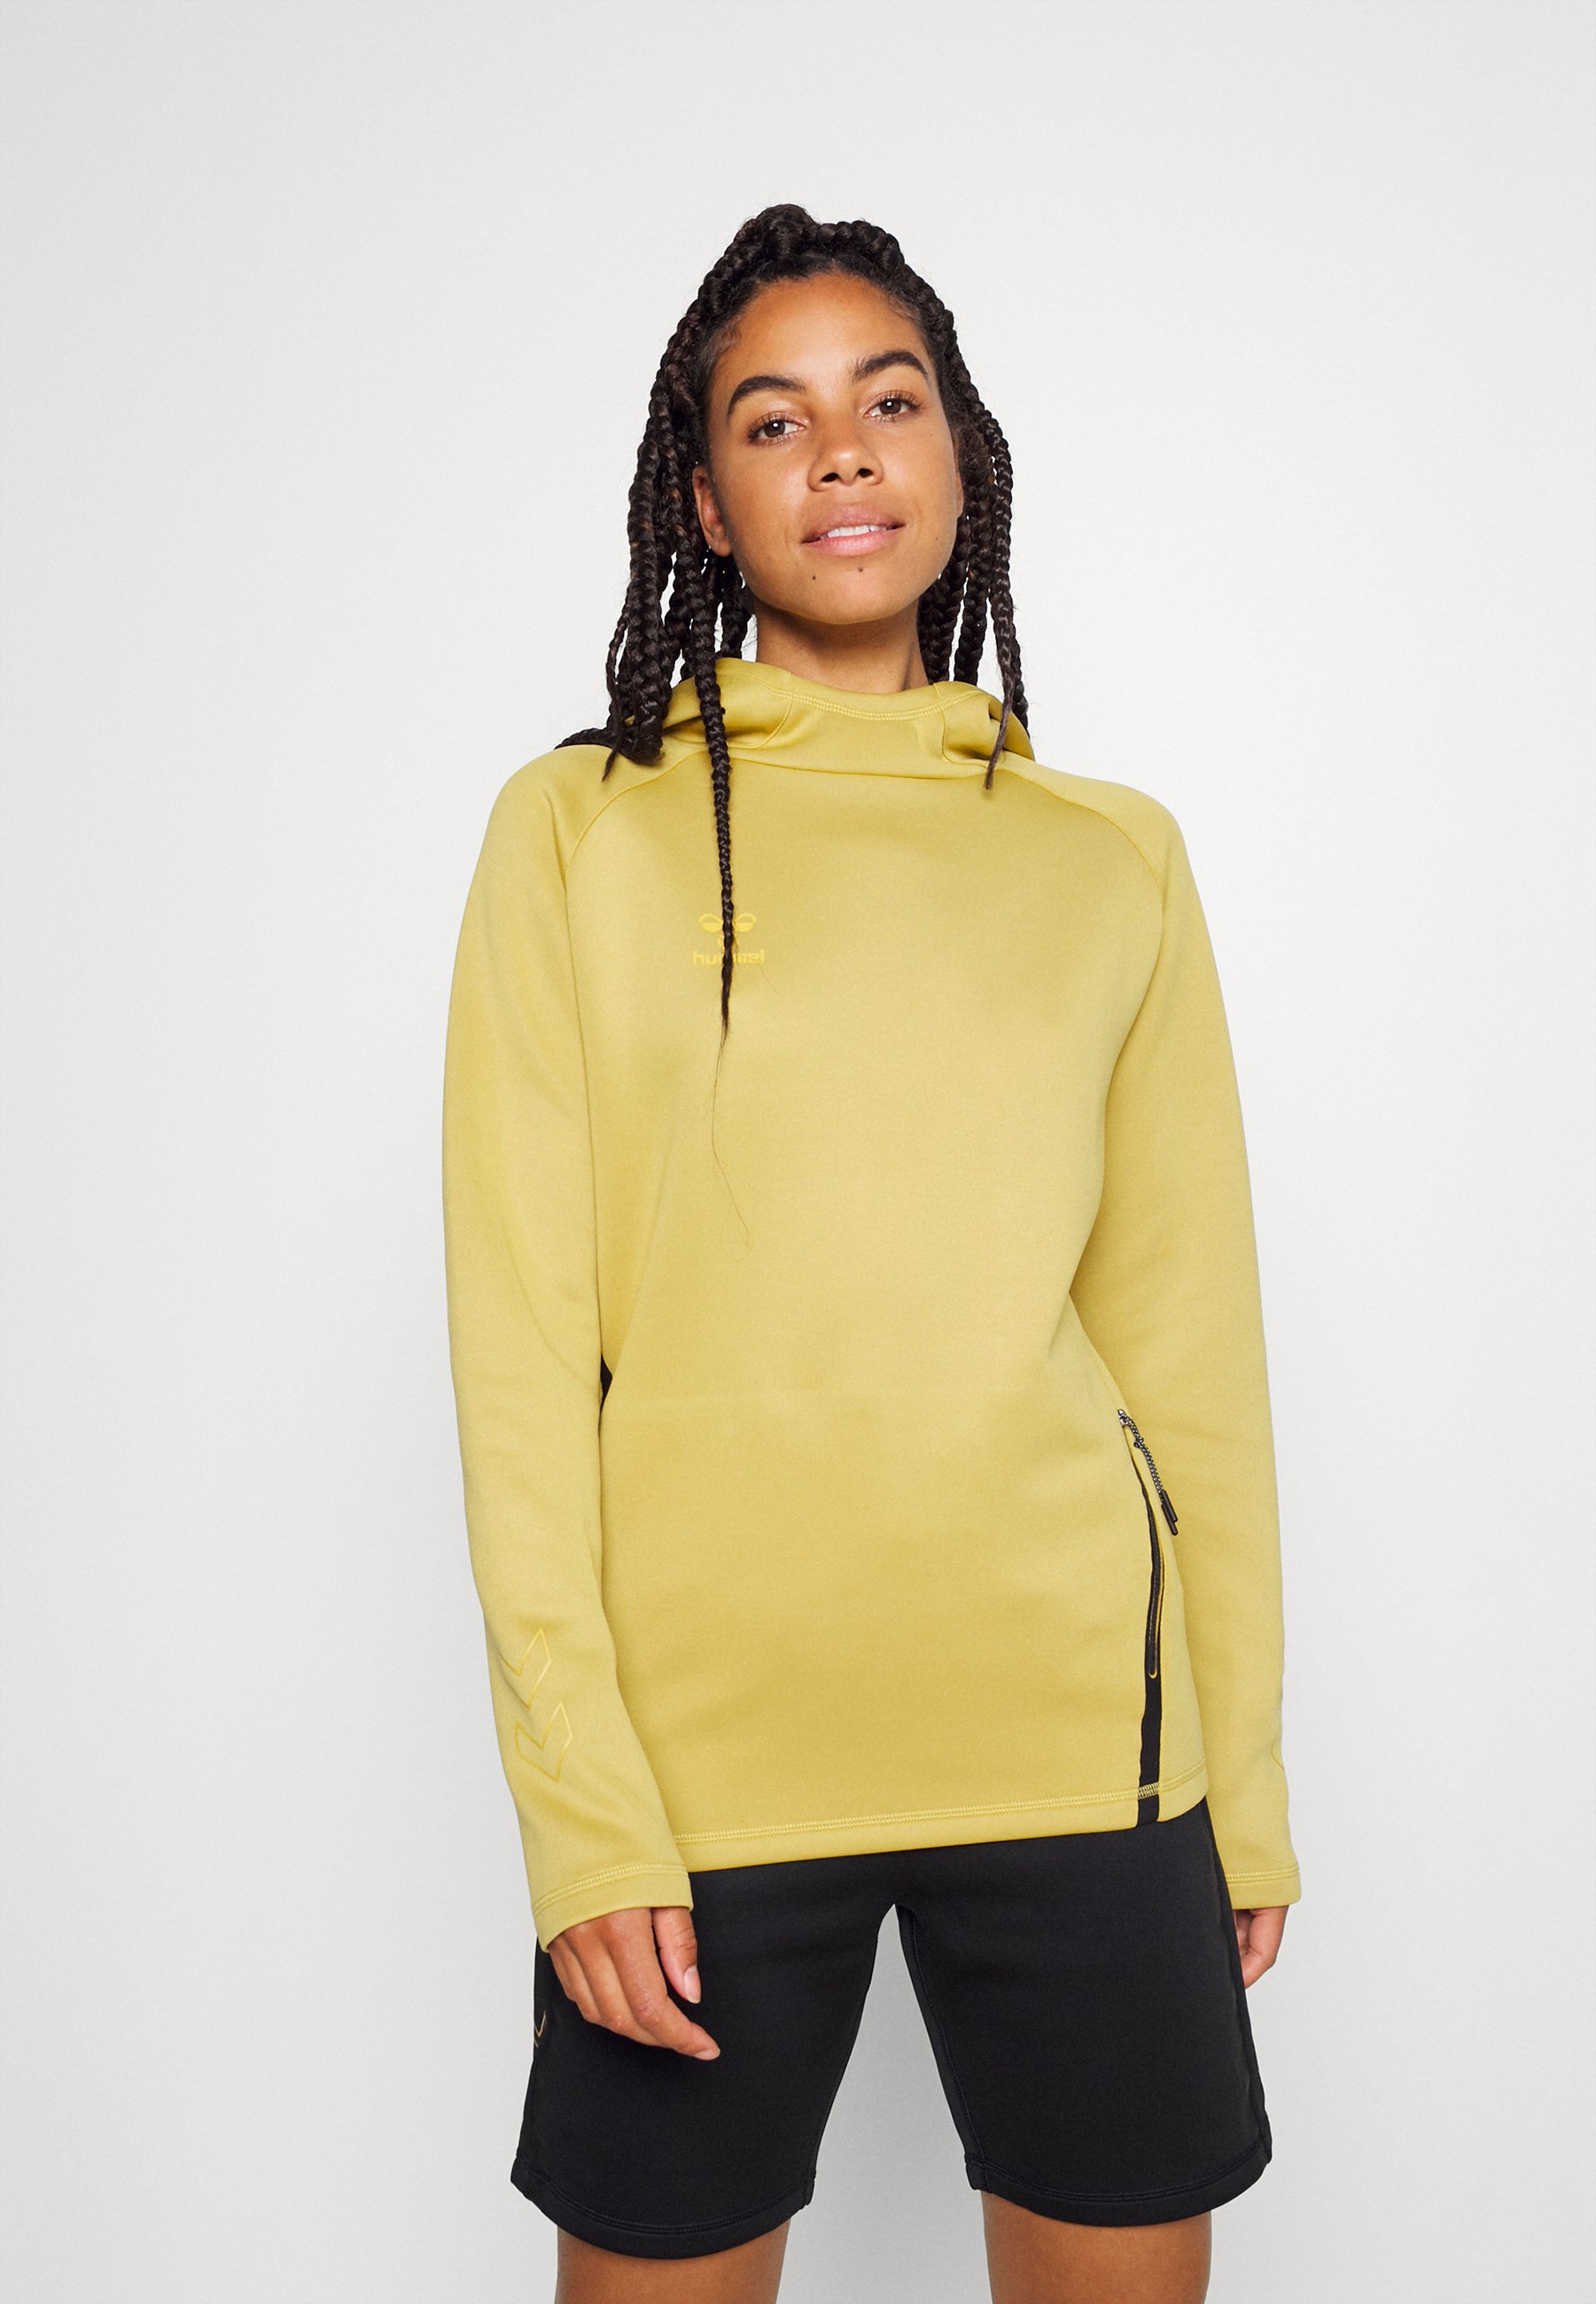 Women HMLCIMA HOODIE WOMAN - Sweatshirt